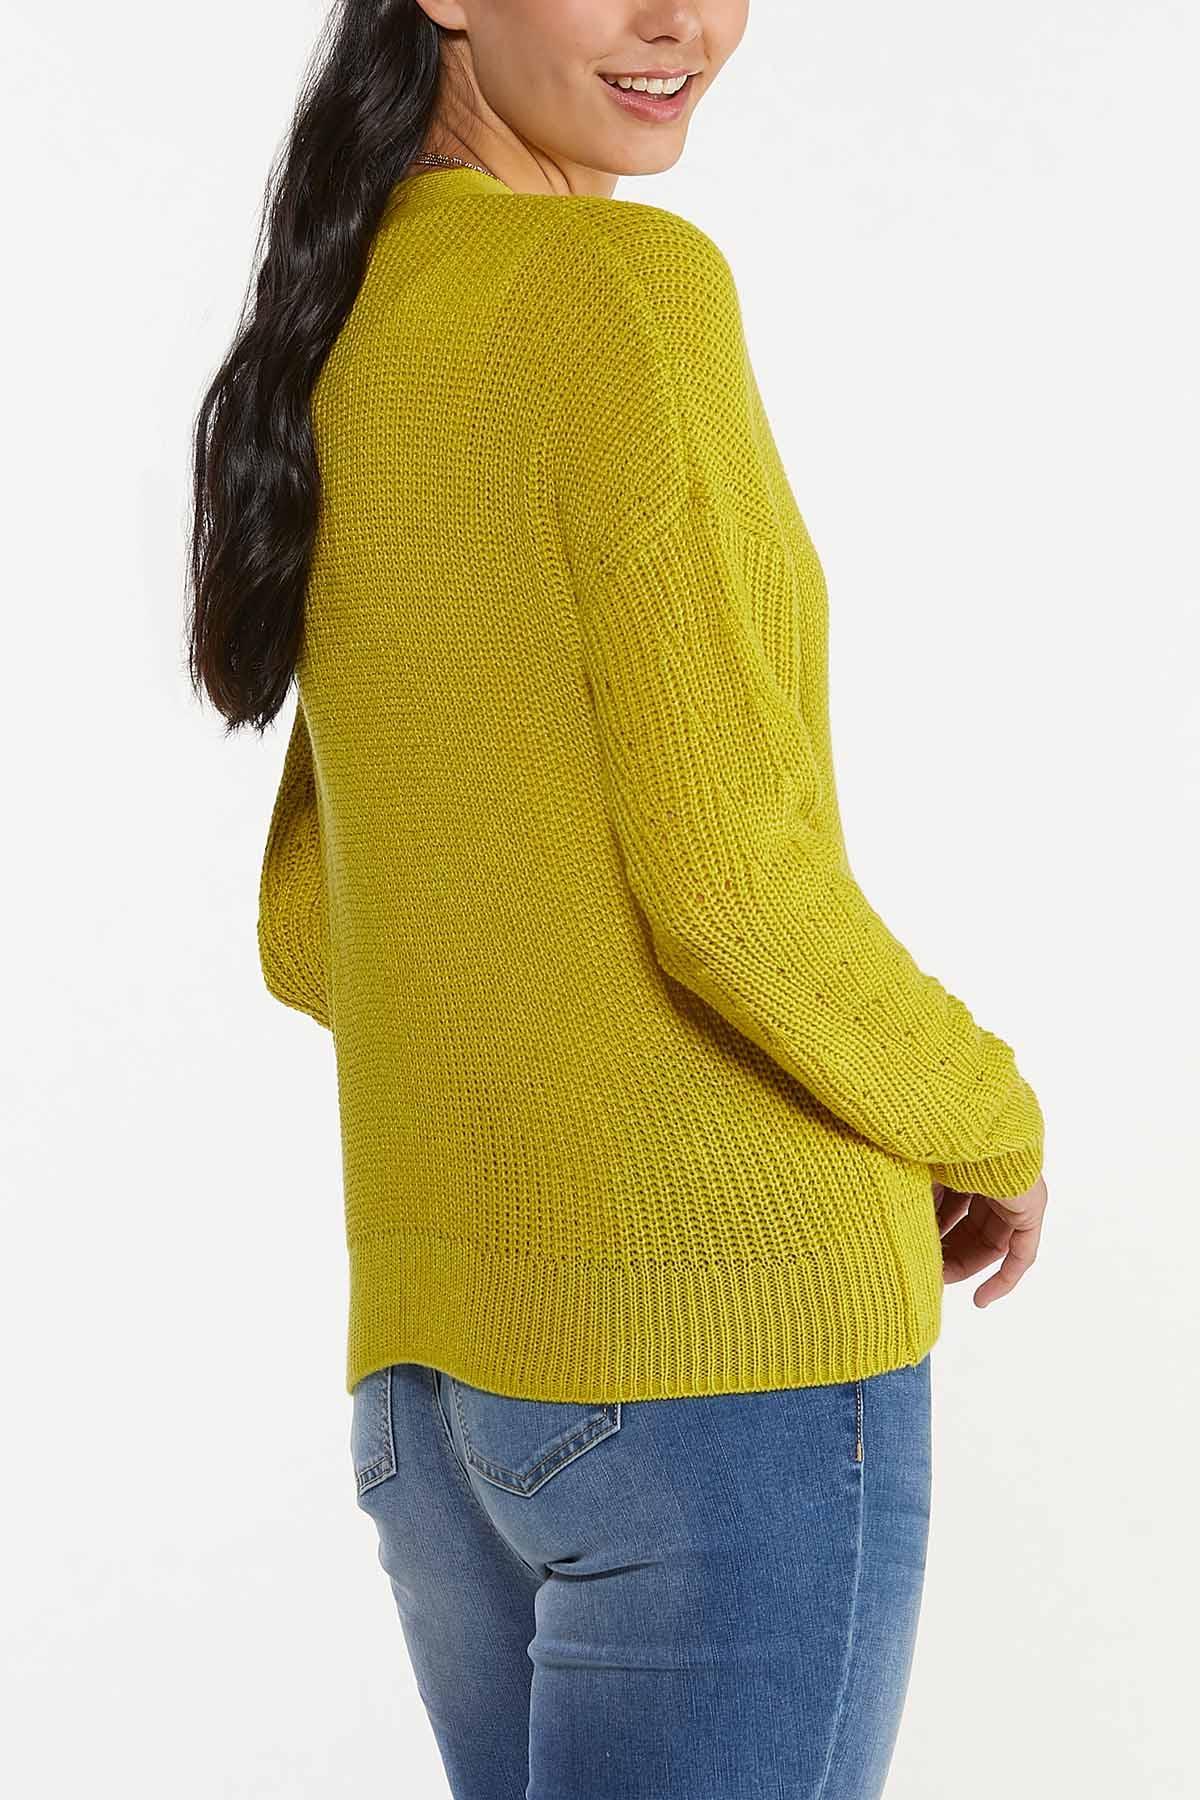 Cutout Cardigan Sweater (Item #44660362)